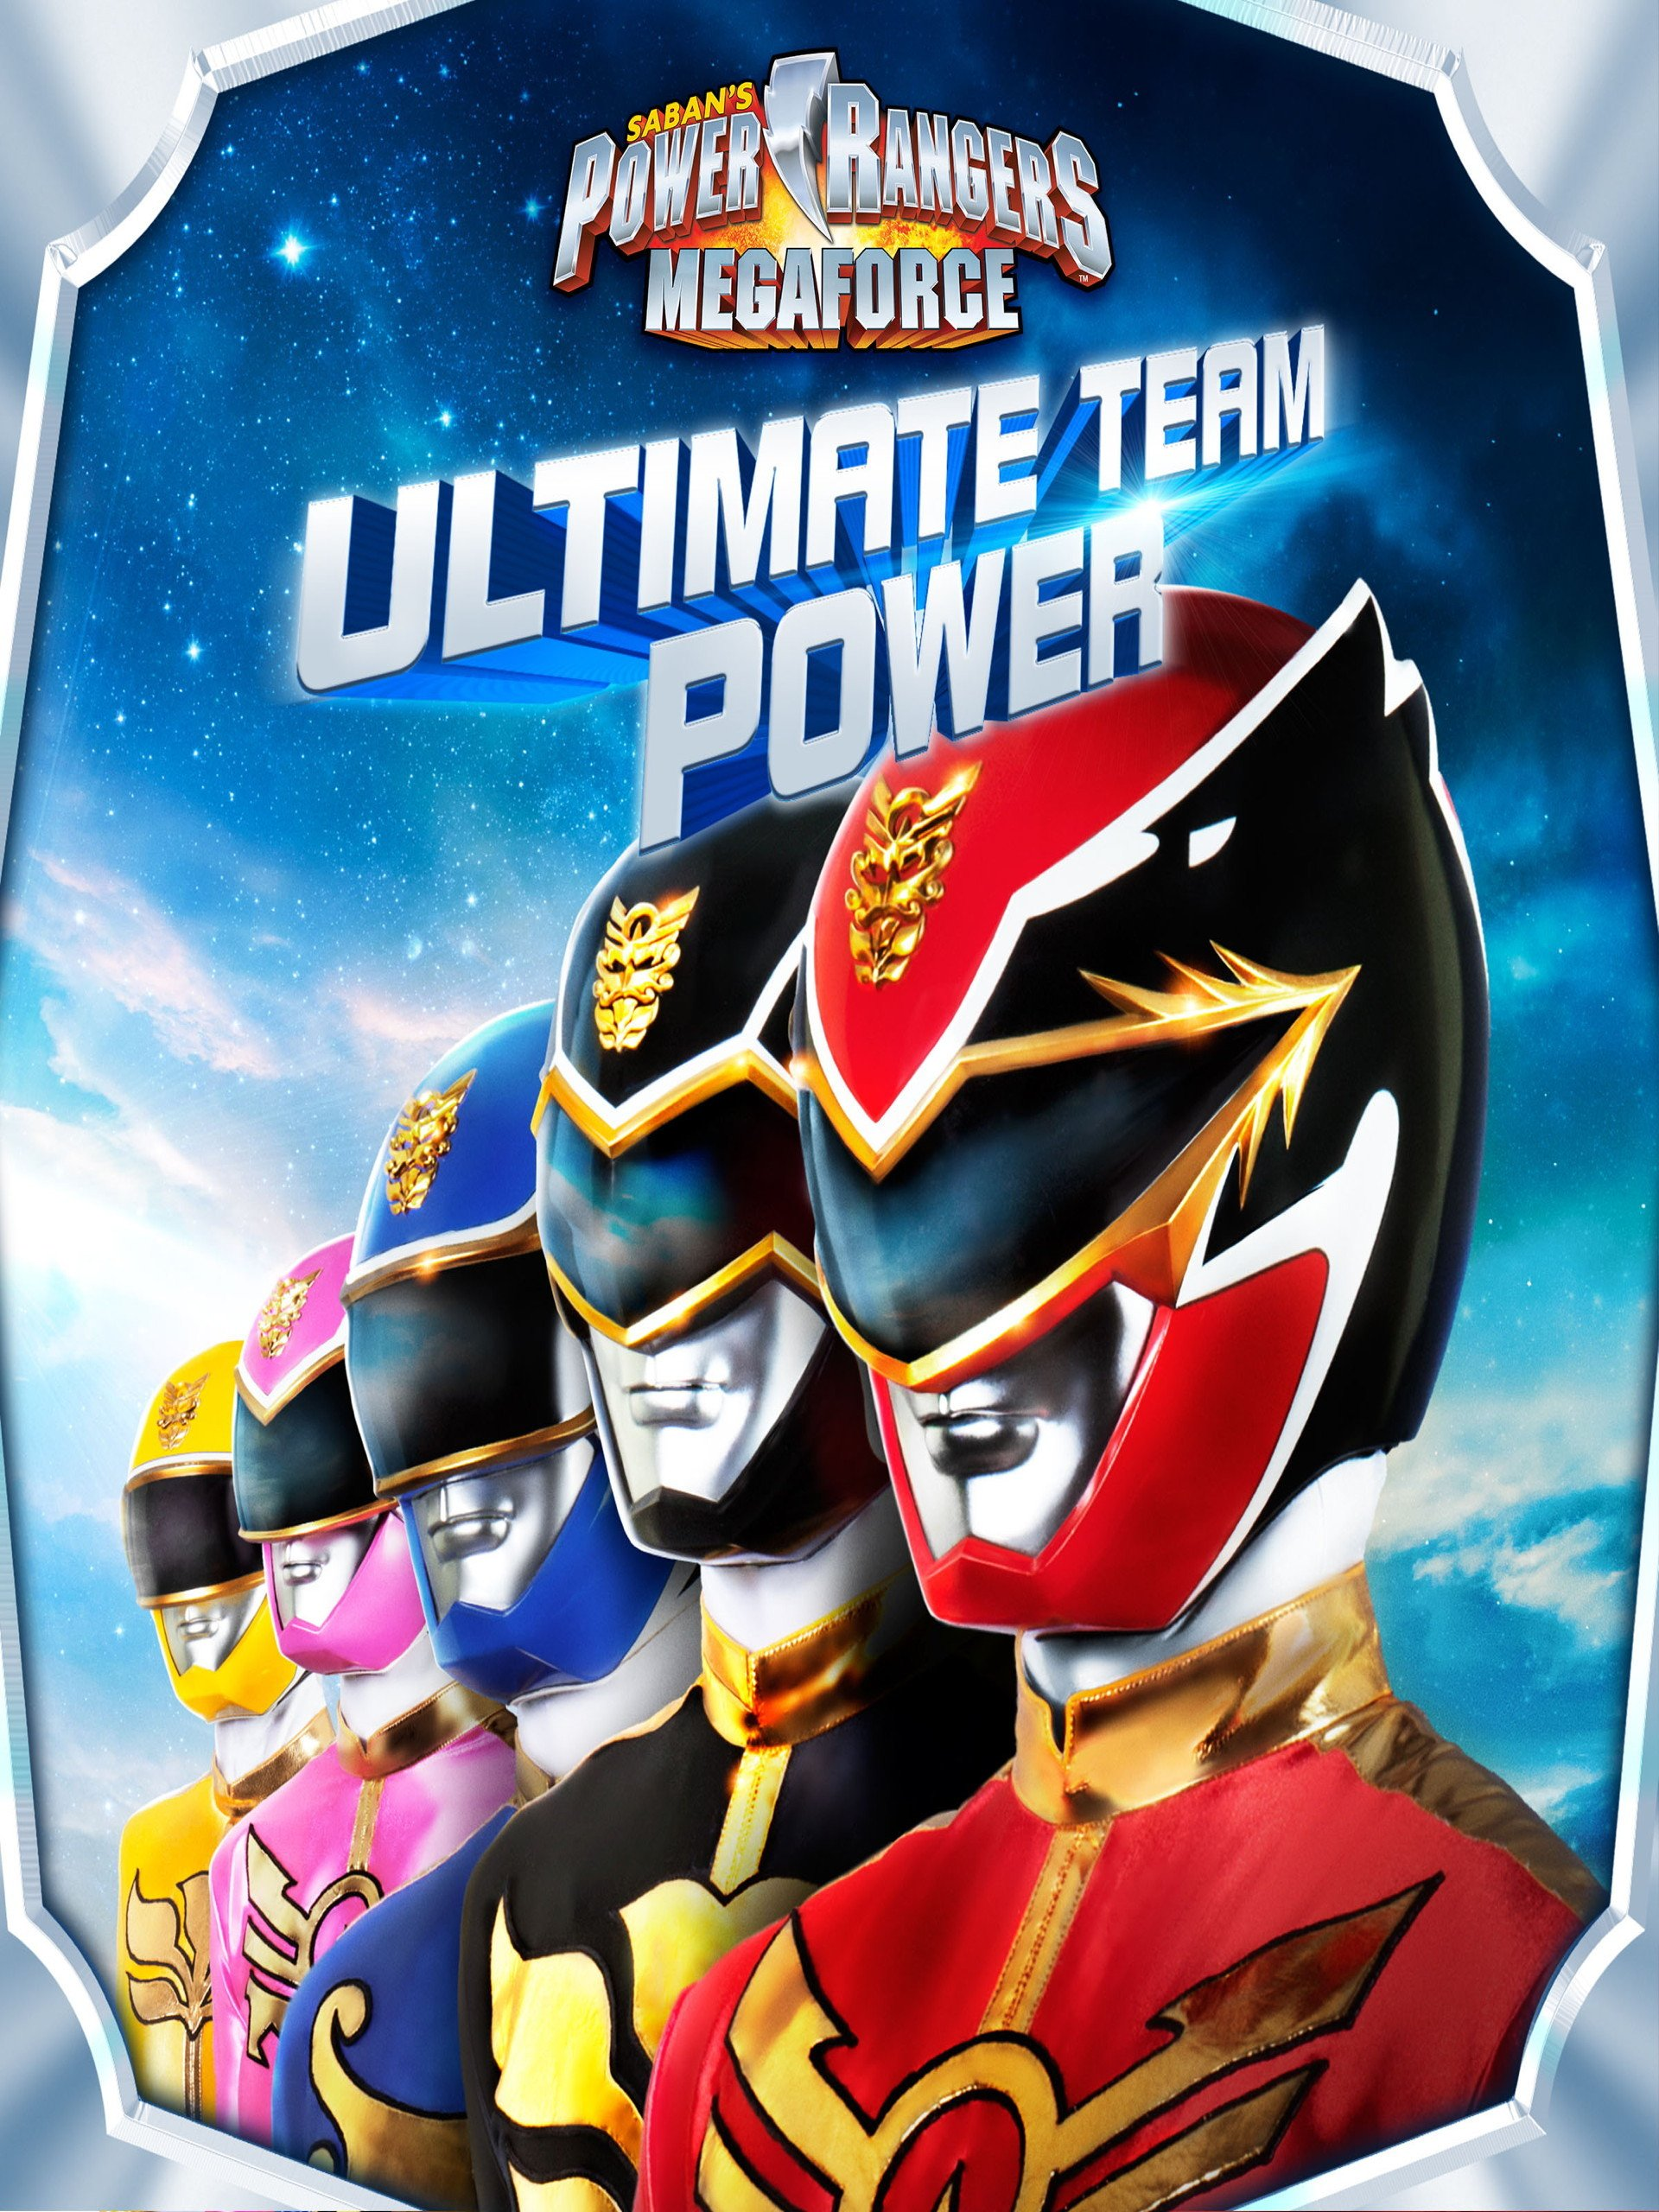 Amazon.com: Power Rangers Megaforce: Ultimate Team Power: Andrew Gray, John Mark Loudermilk, Ciara Hanna, Azim Rizk: Amazon Digital Services LLC